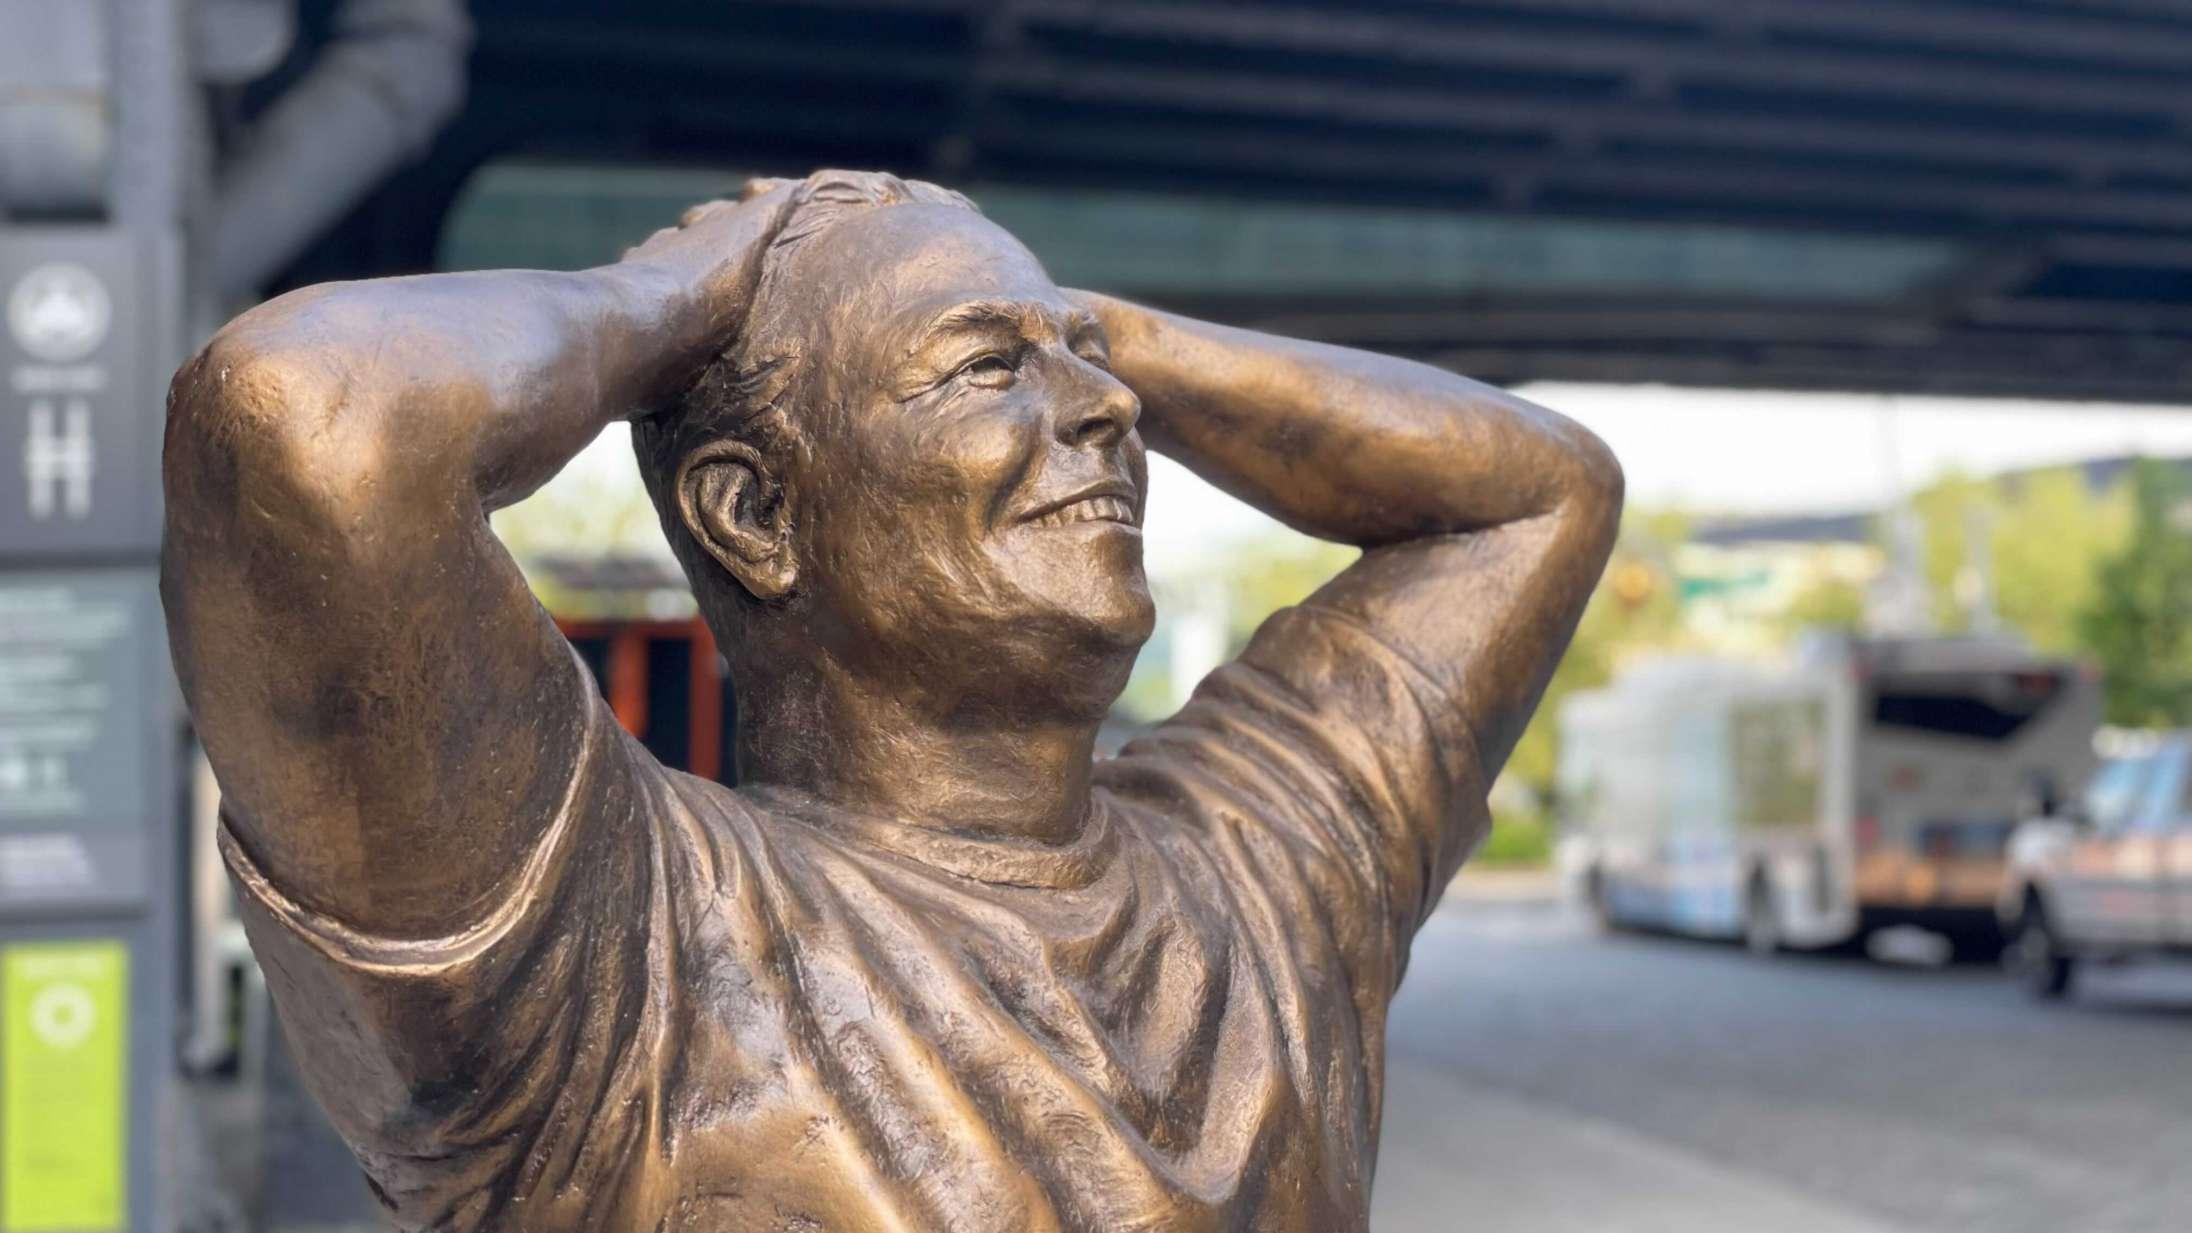 Elon Musks 50-års fødselsdag fejres med bizar statue midt i New York